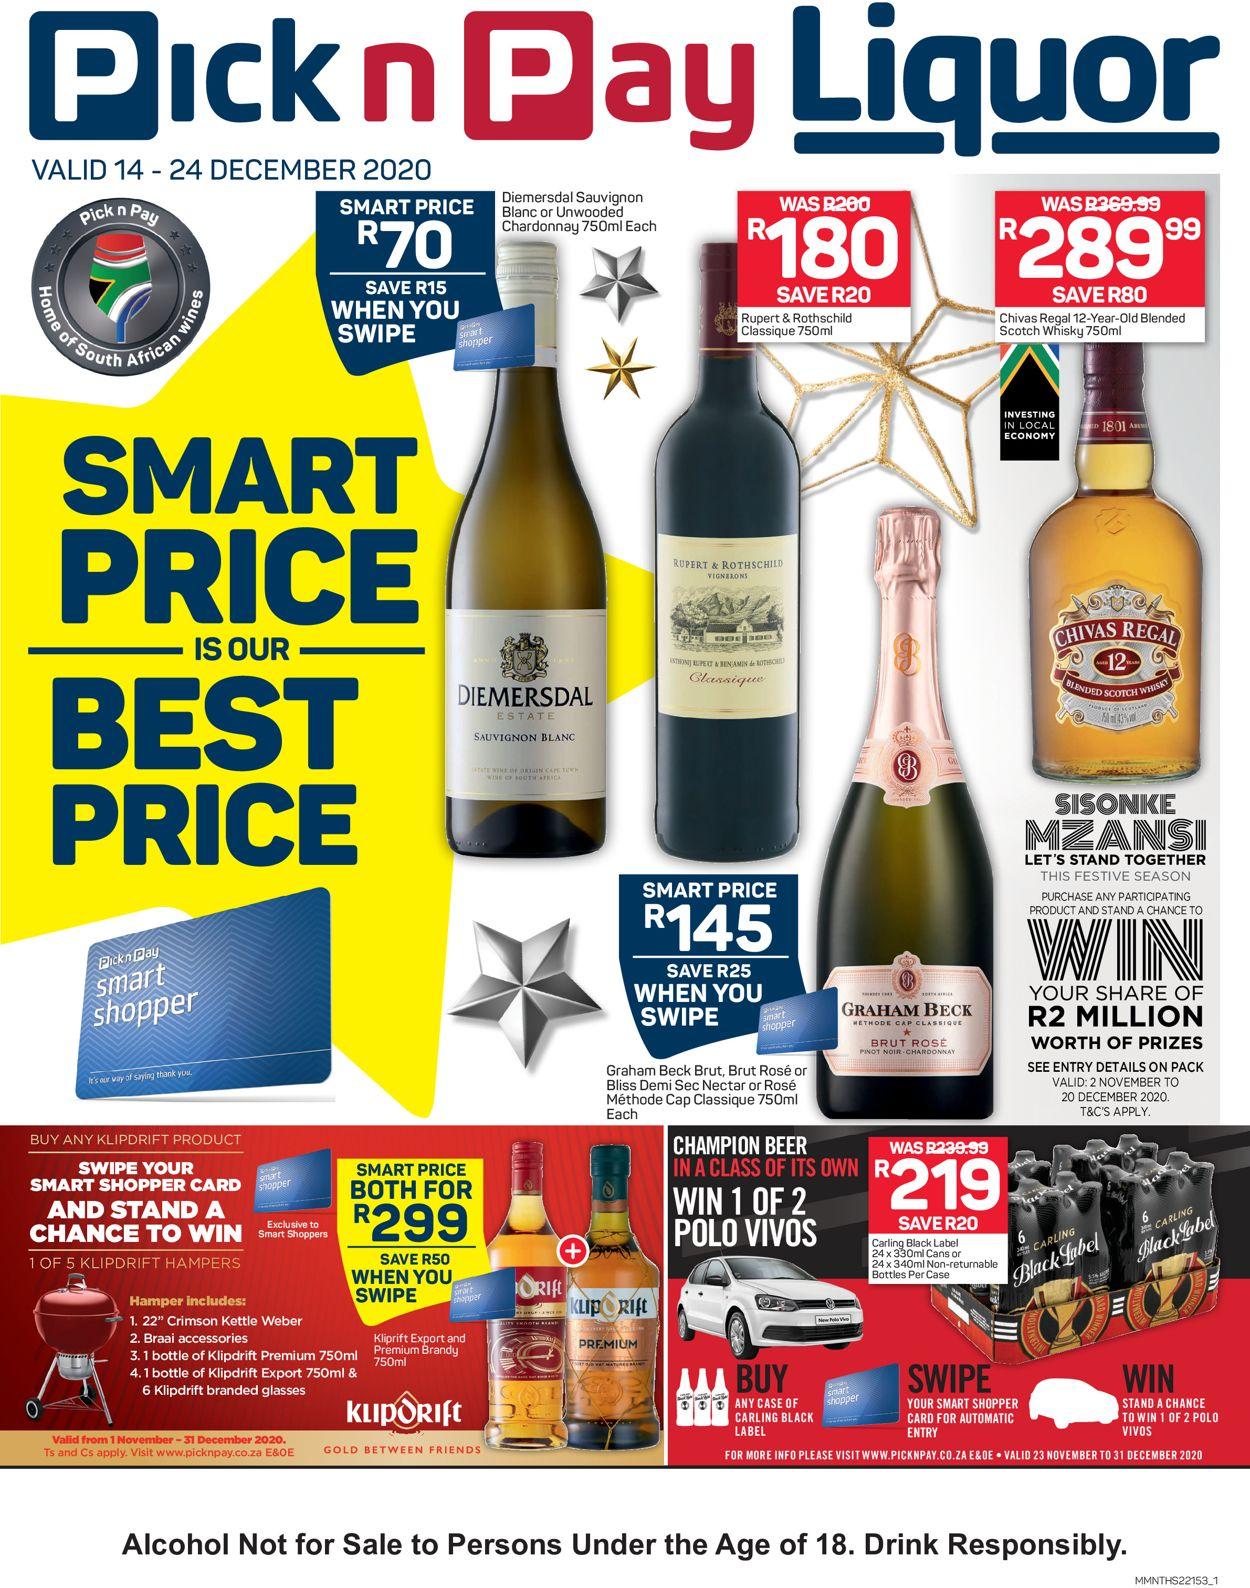 Pick n Pay Liquor 2020 Catalogue - 2020/12/14-2020/12/24